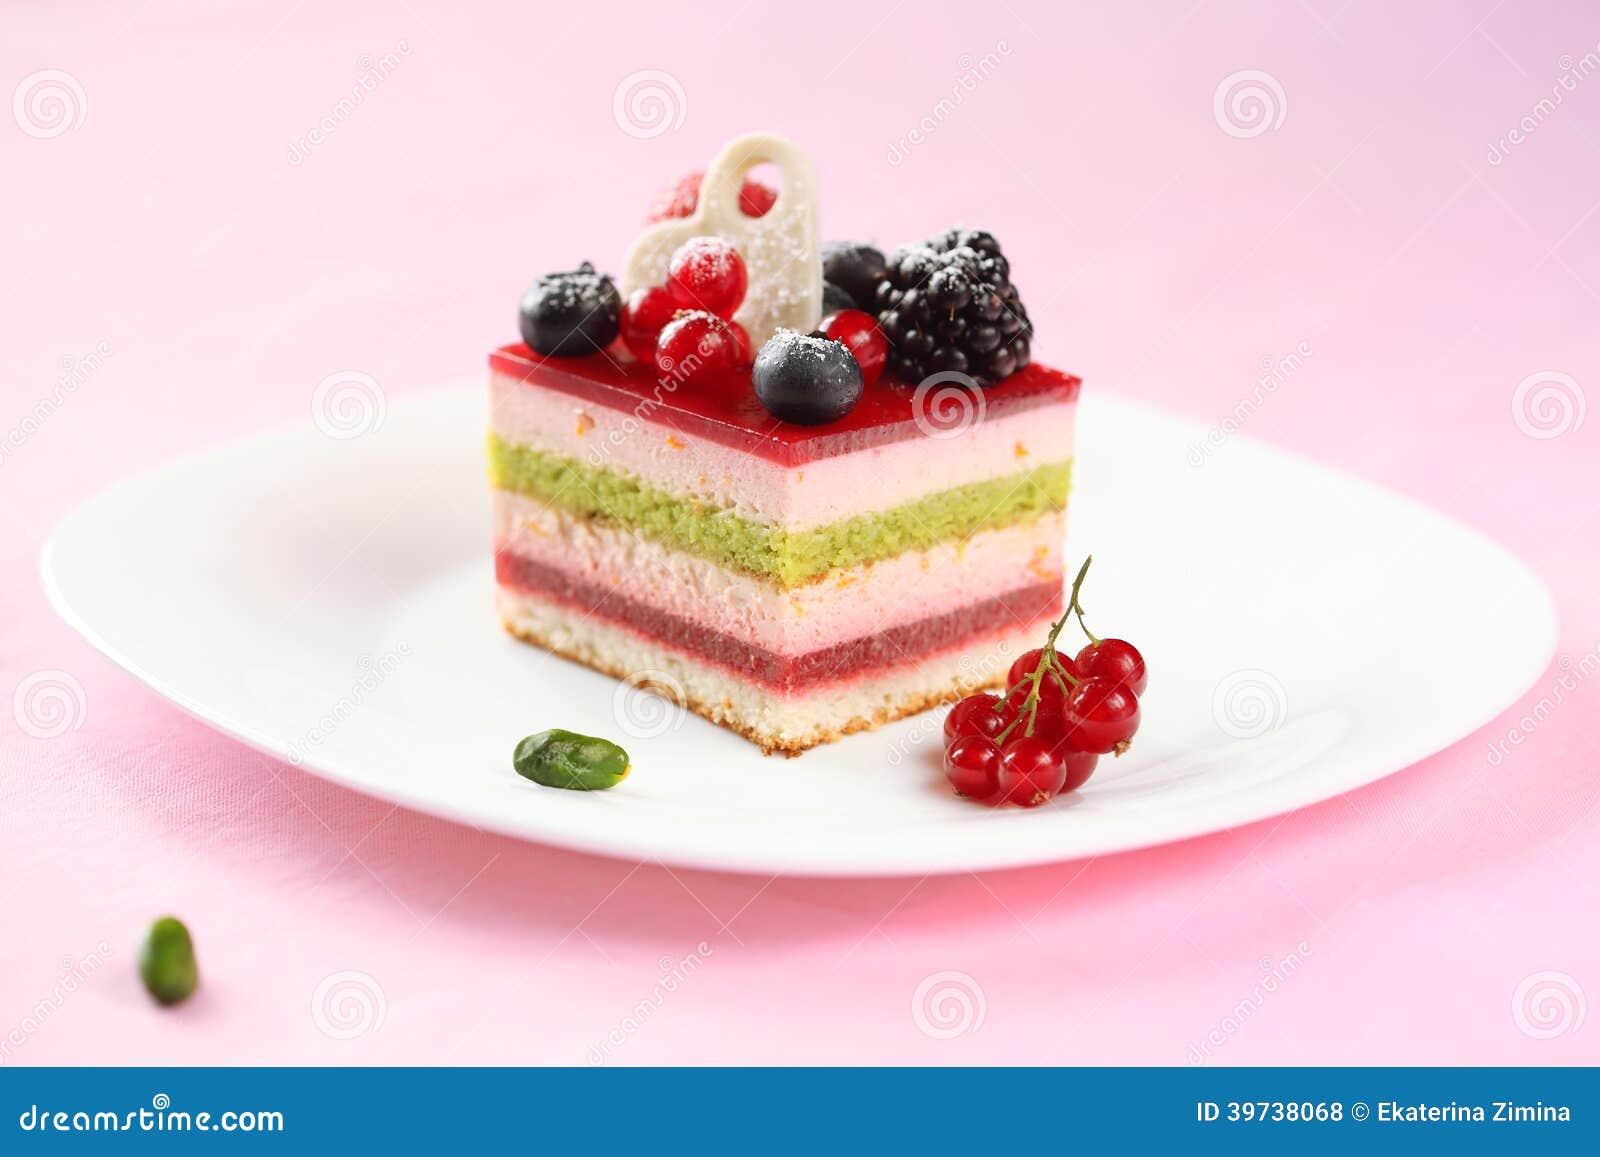 Strawberry And Blueberry Cake On White Background